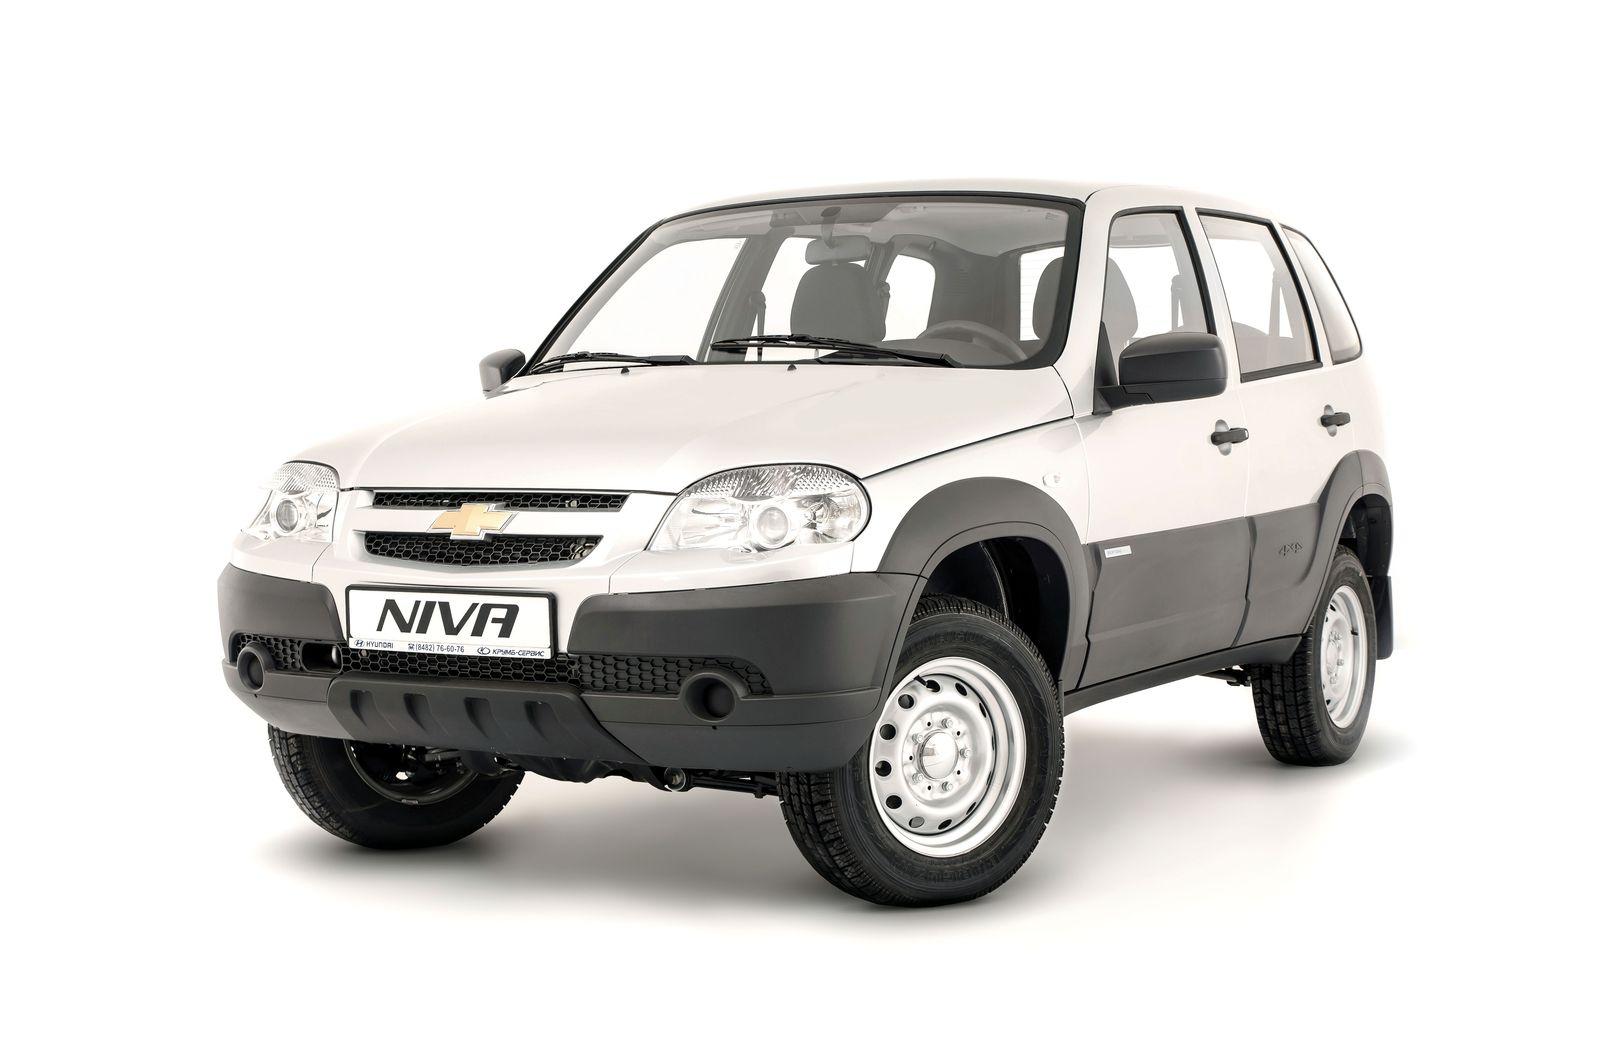 Автолюбитель на Chevrolet Niva доехал до суда - журнал За рулем